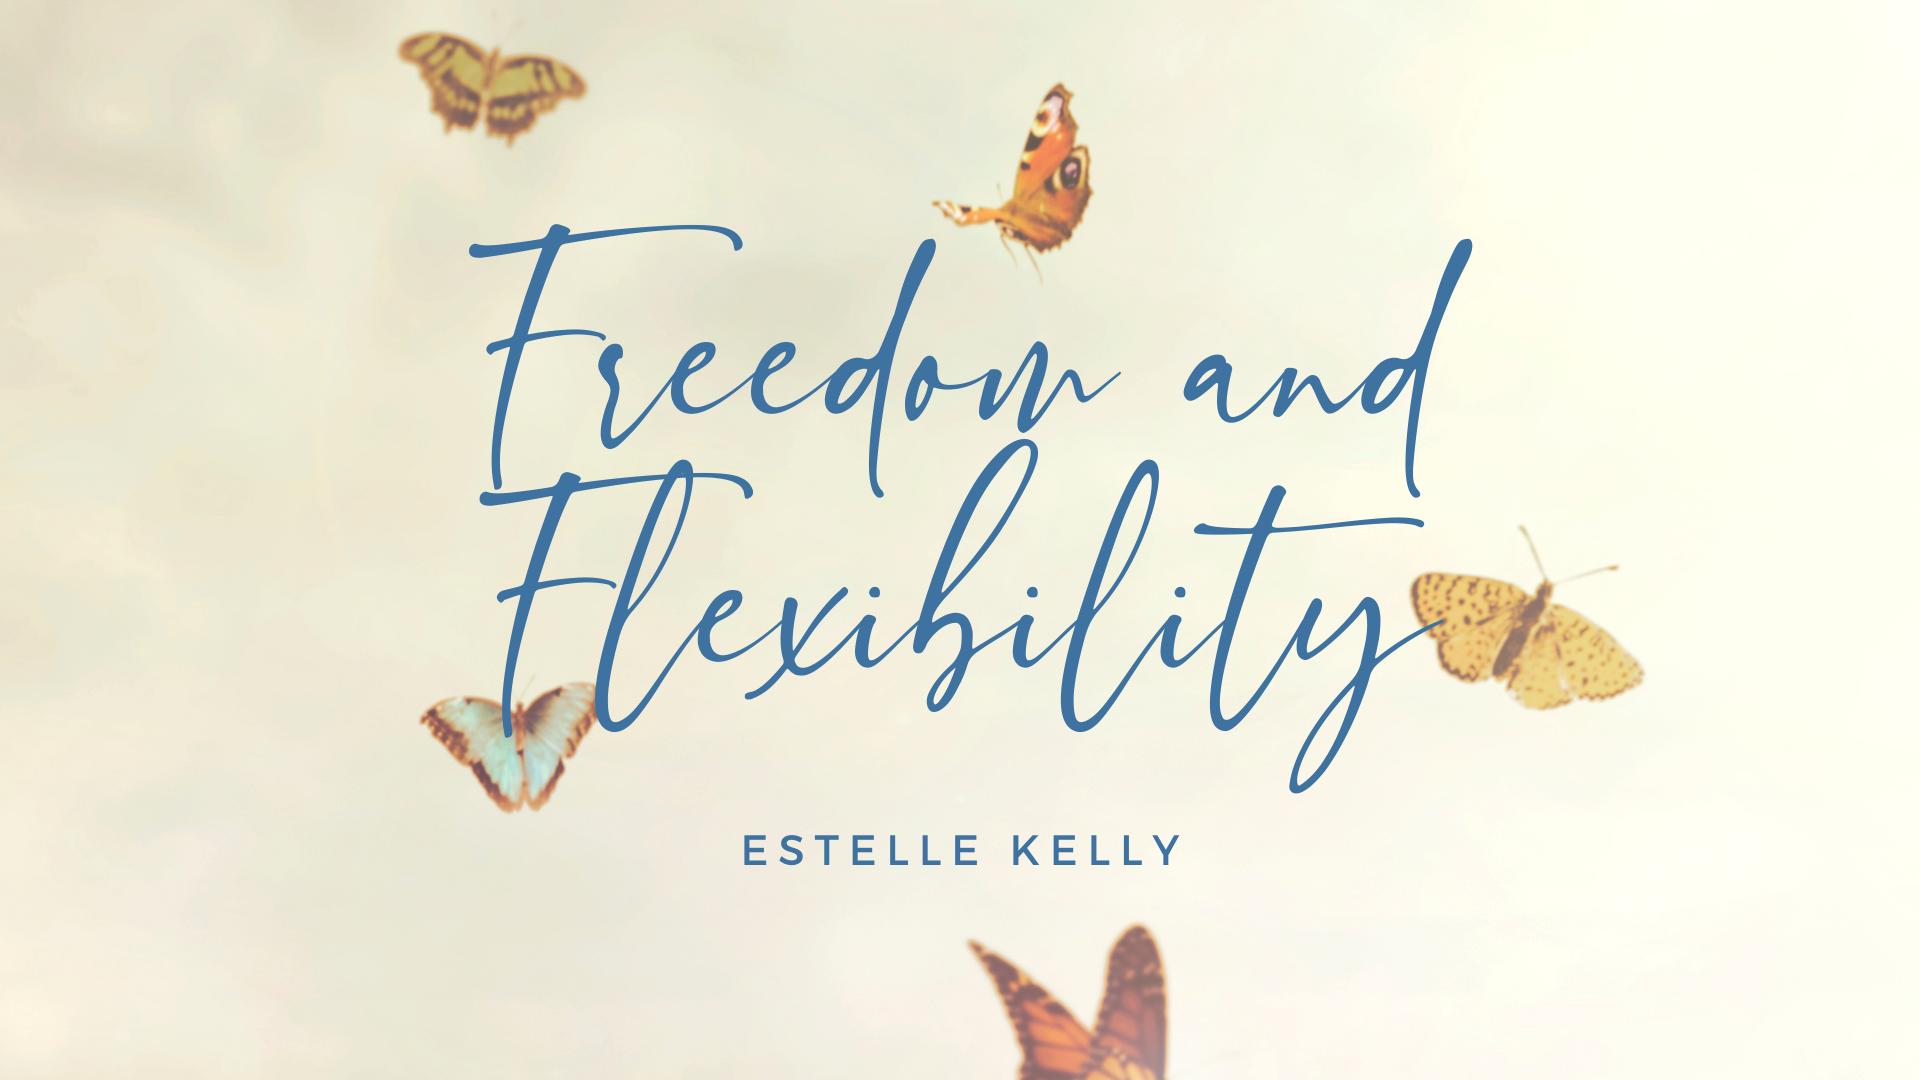 Freedom and Flexibility